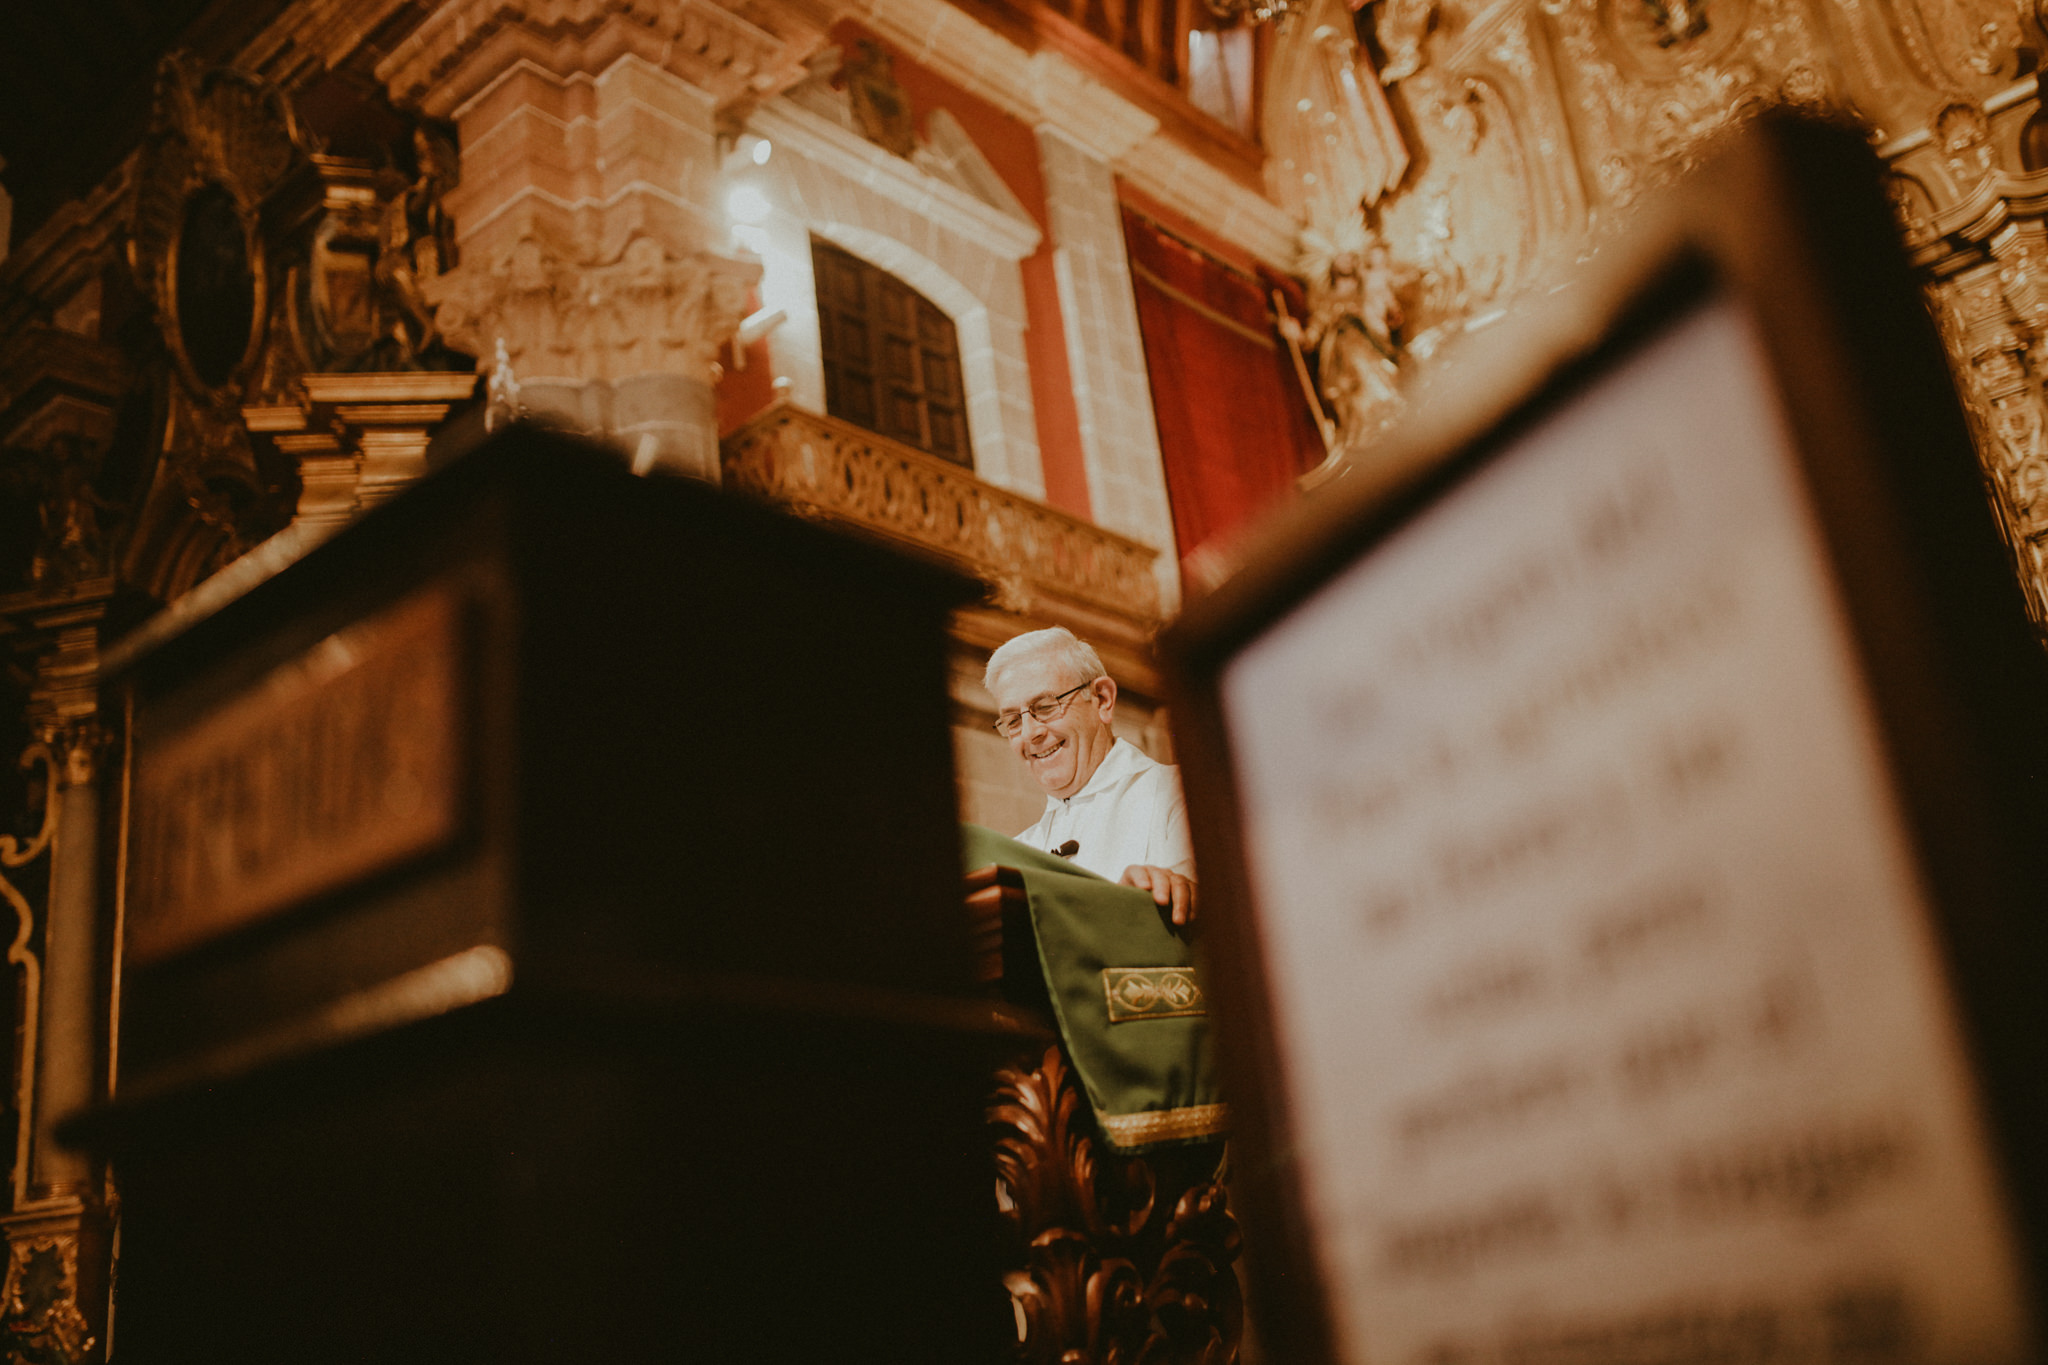 boda-diferente-fotografo-boda-laspalmas-grancanaria-34